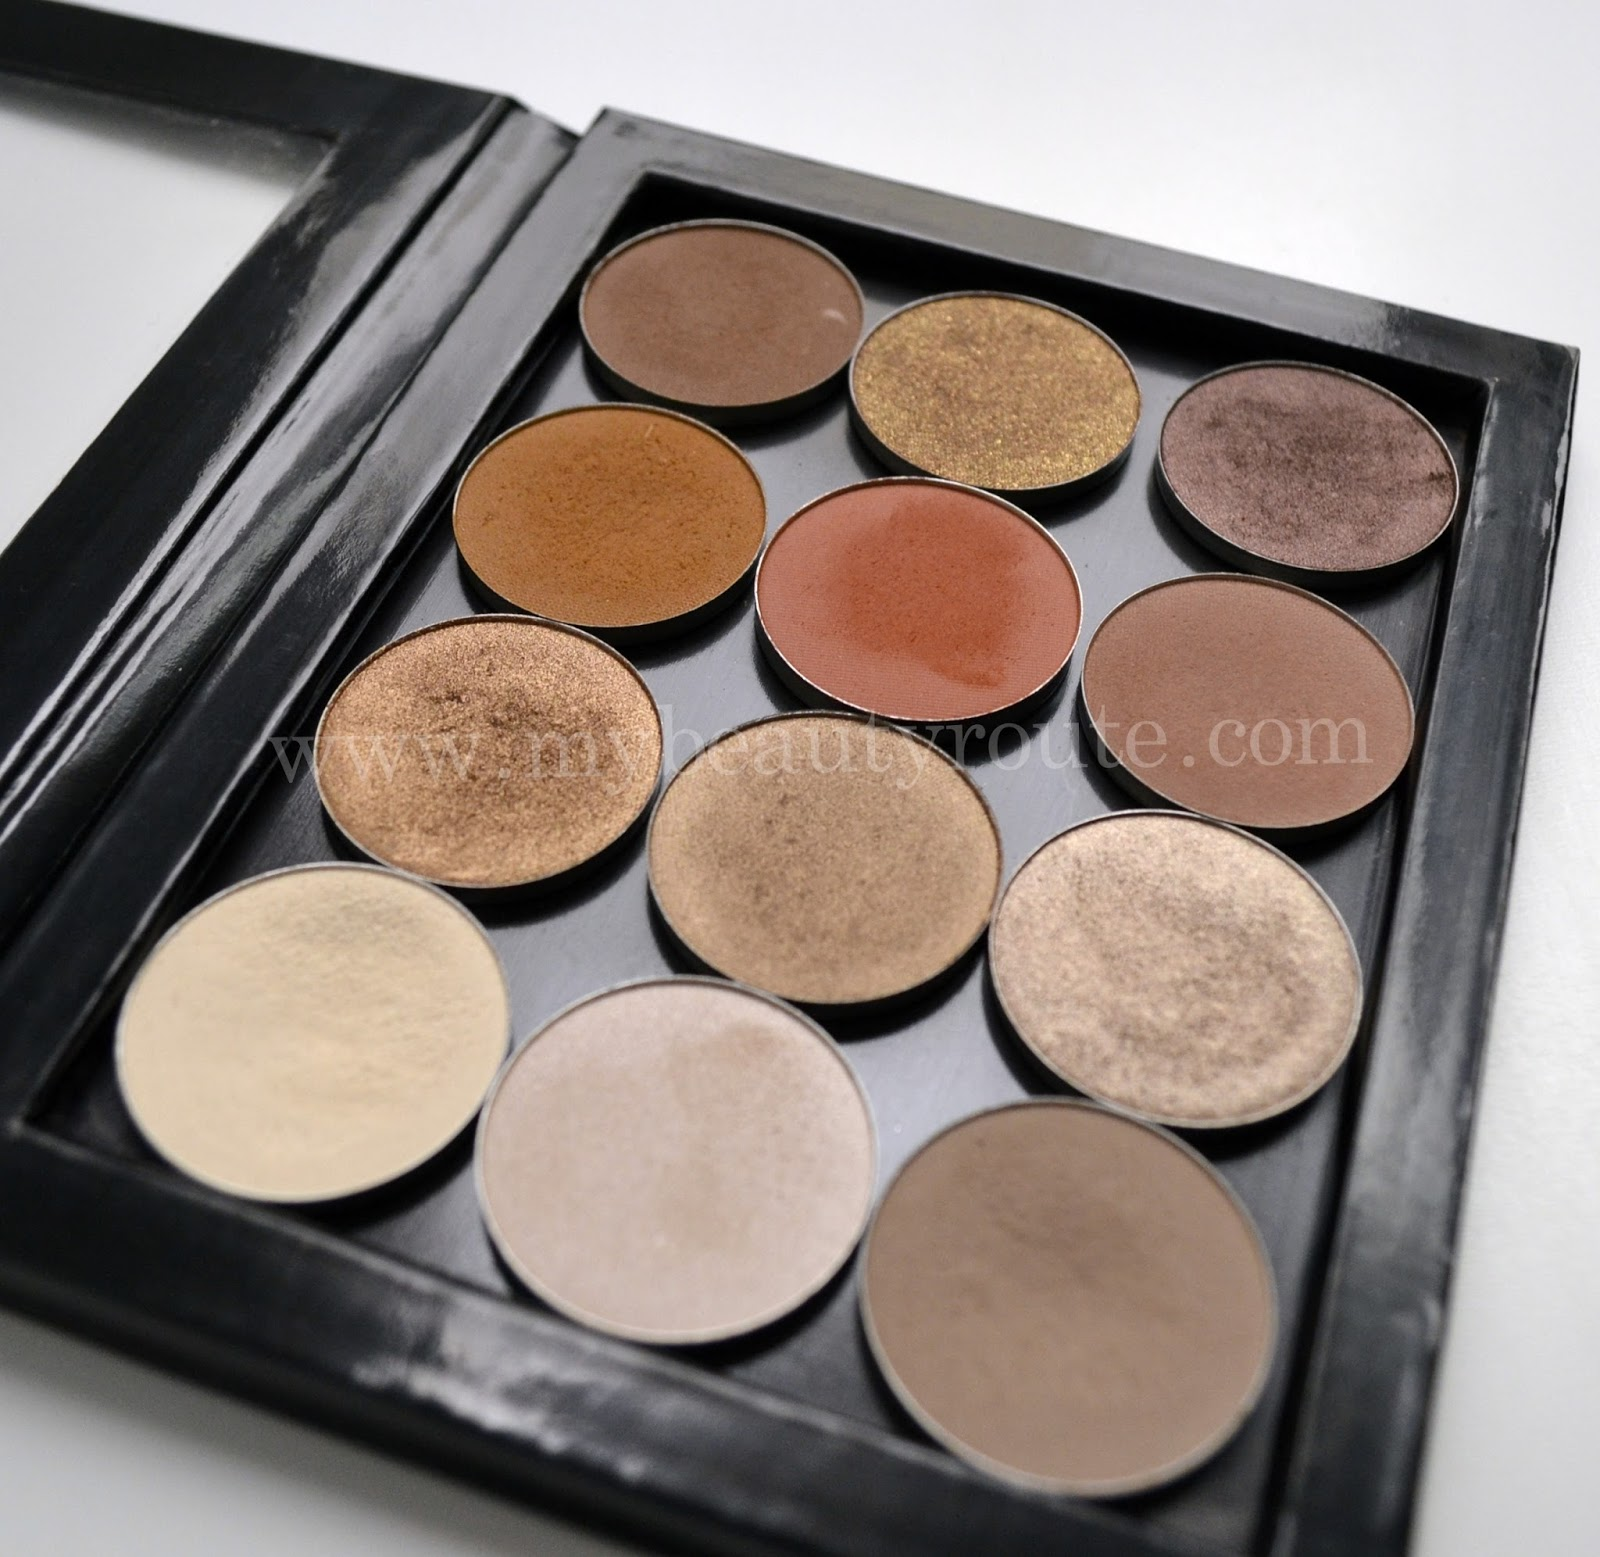 Otra perspectiva paleta sombras de maquillaje tonos neutros Nabla cosmetcis